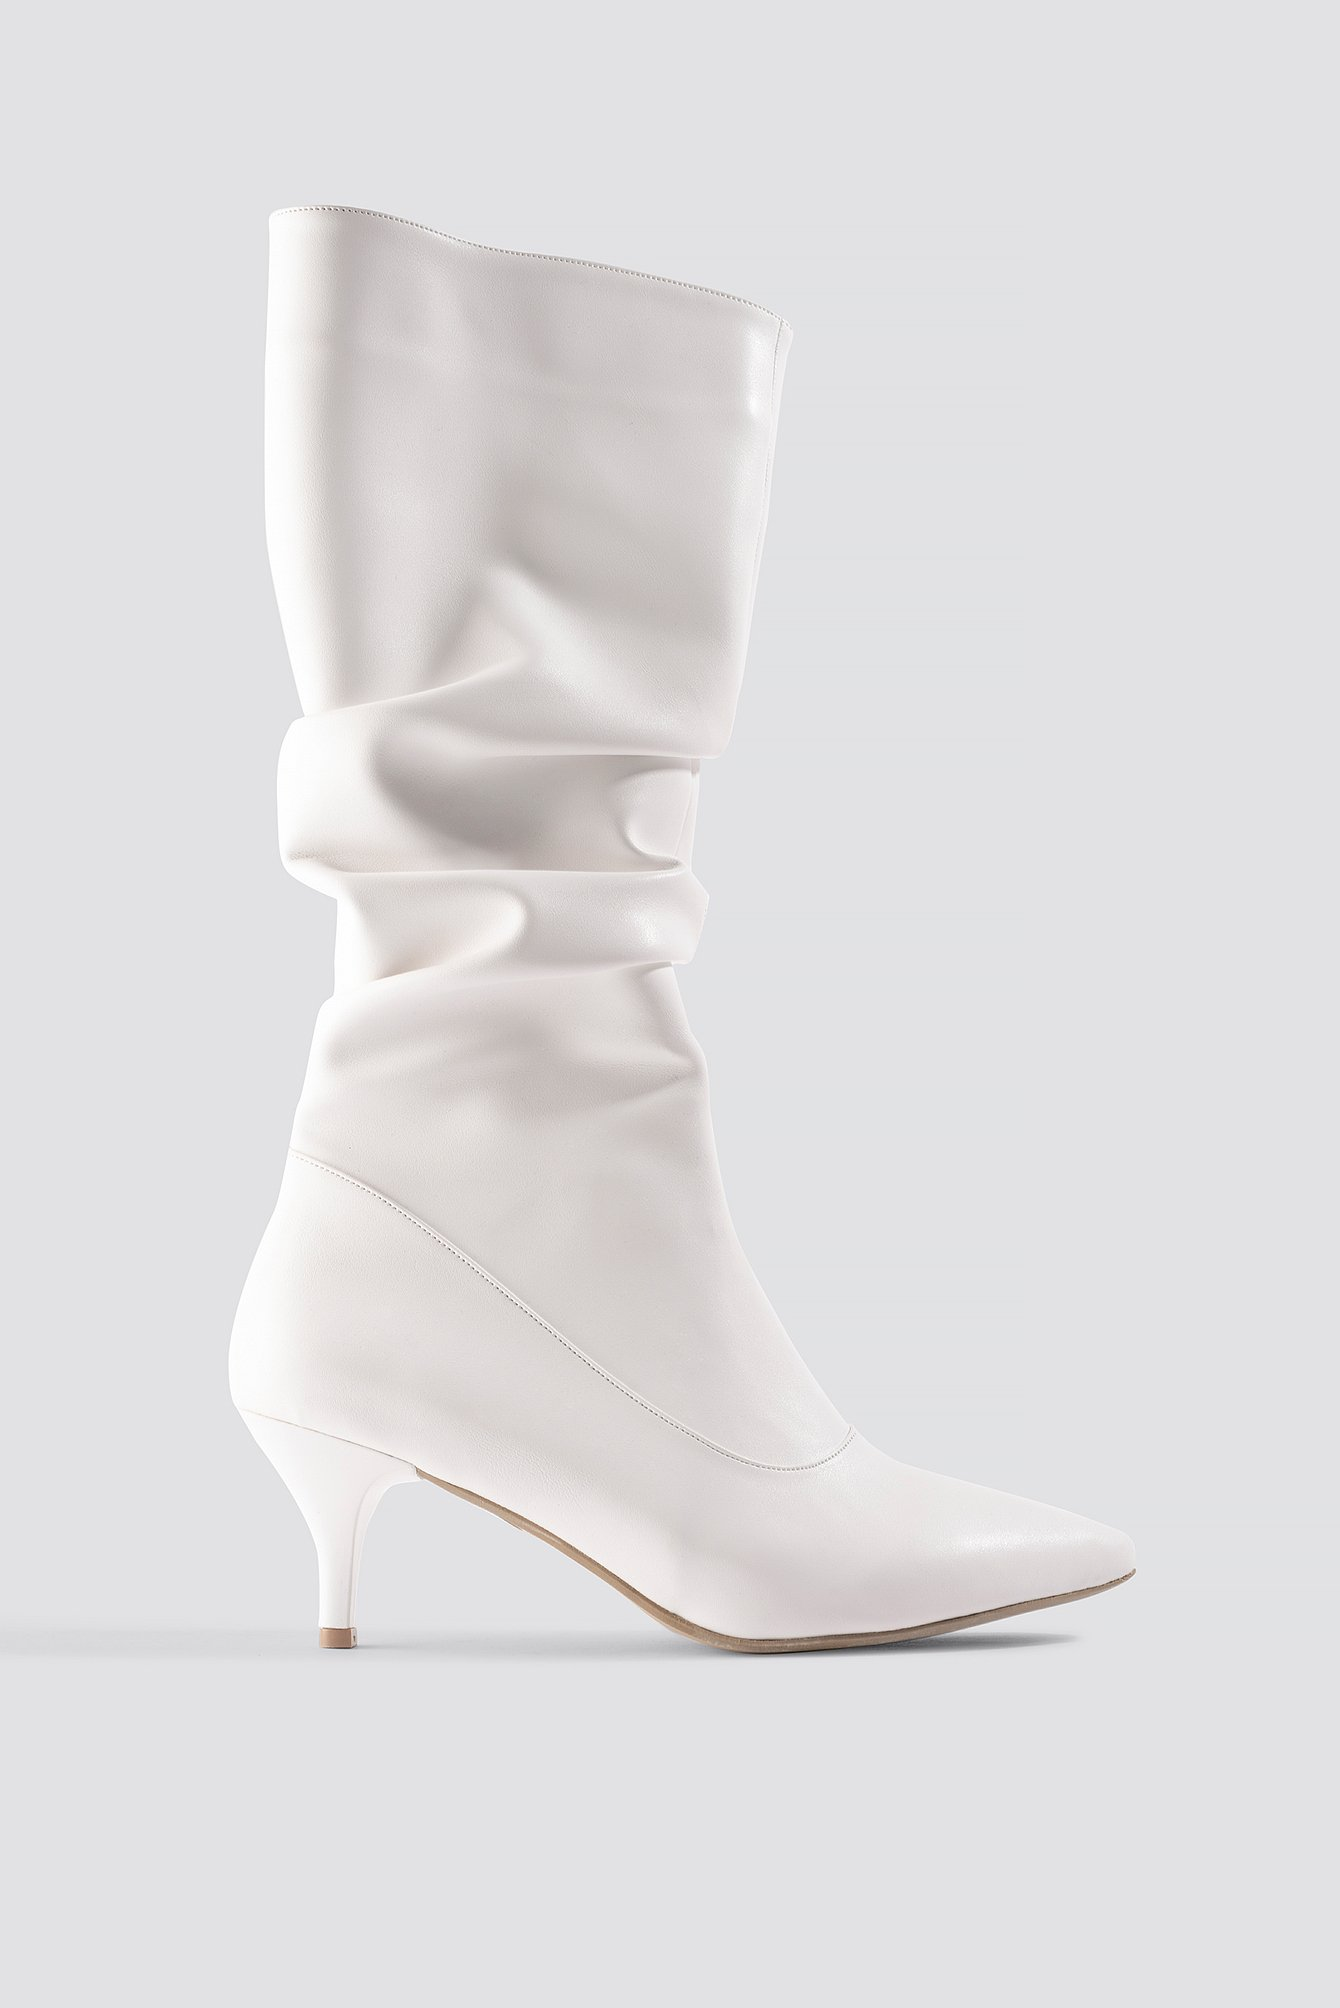 trendyol -  Milla Boots - White